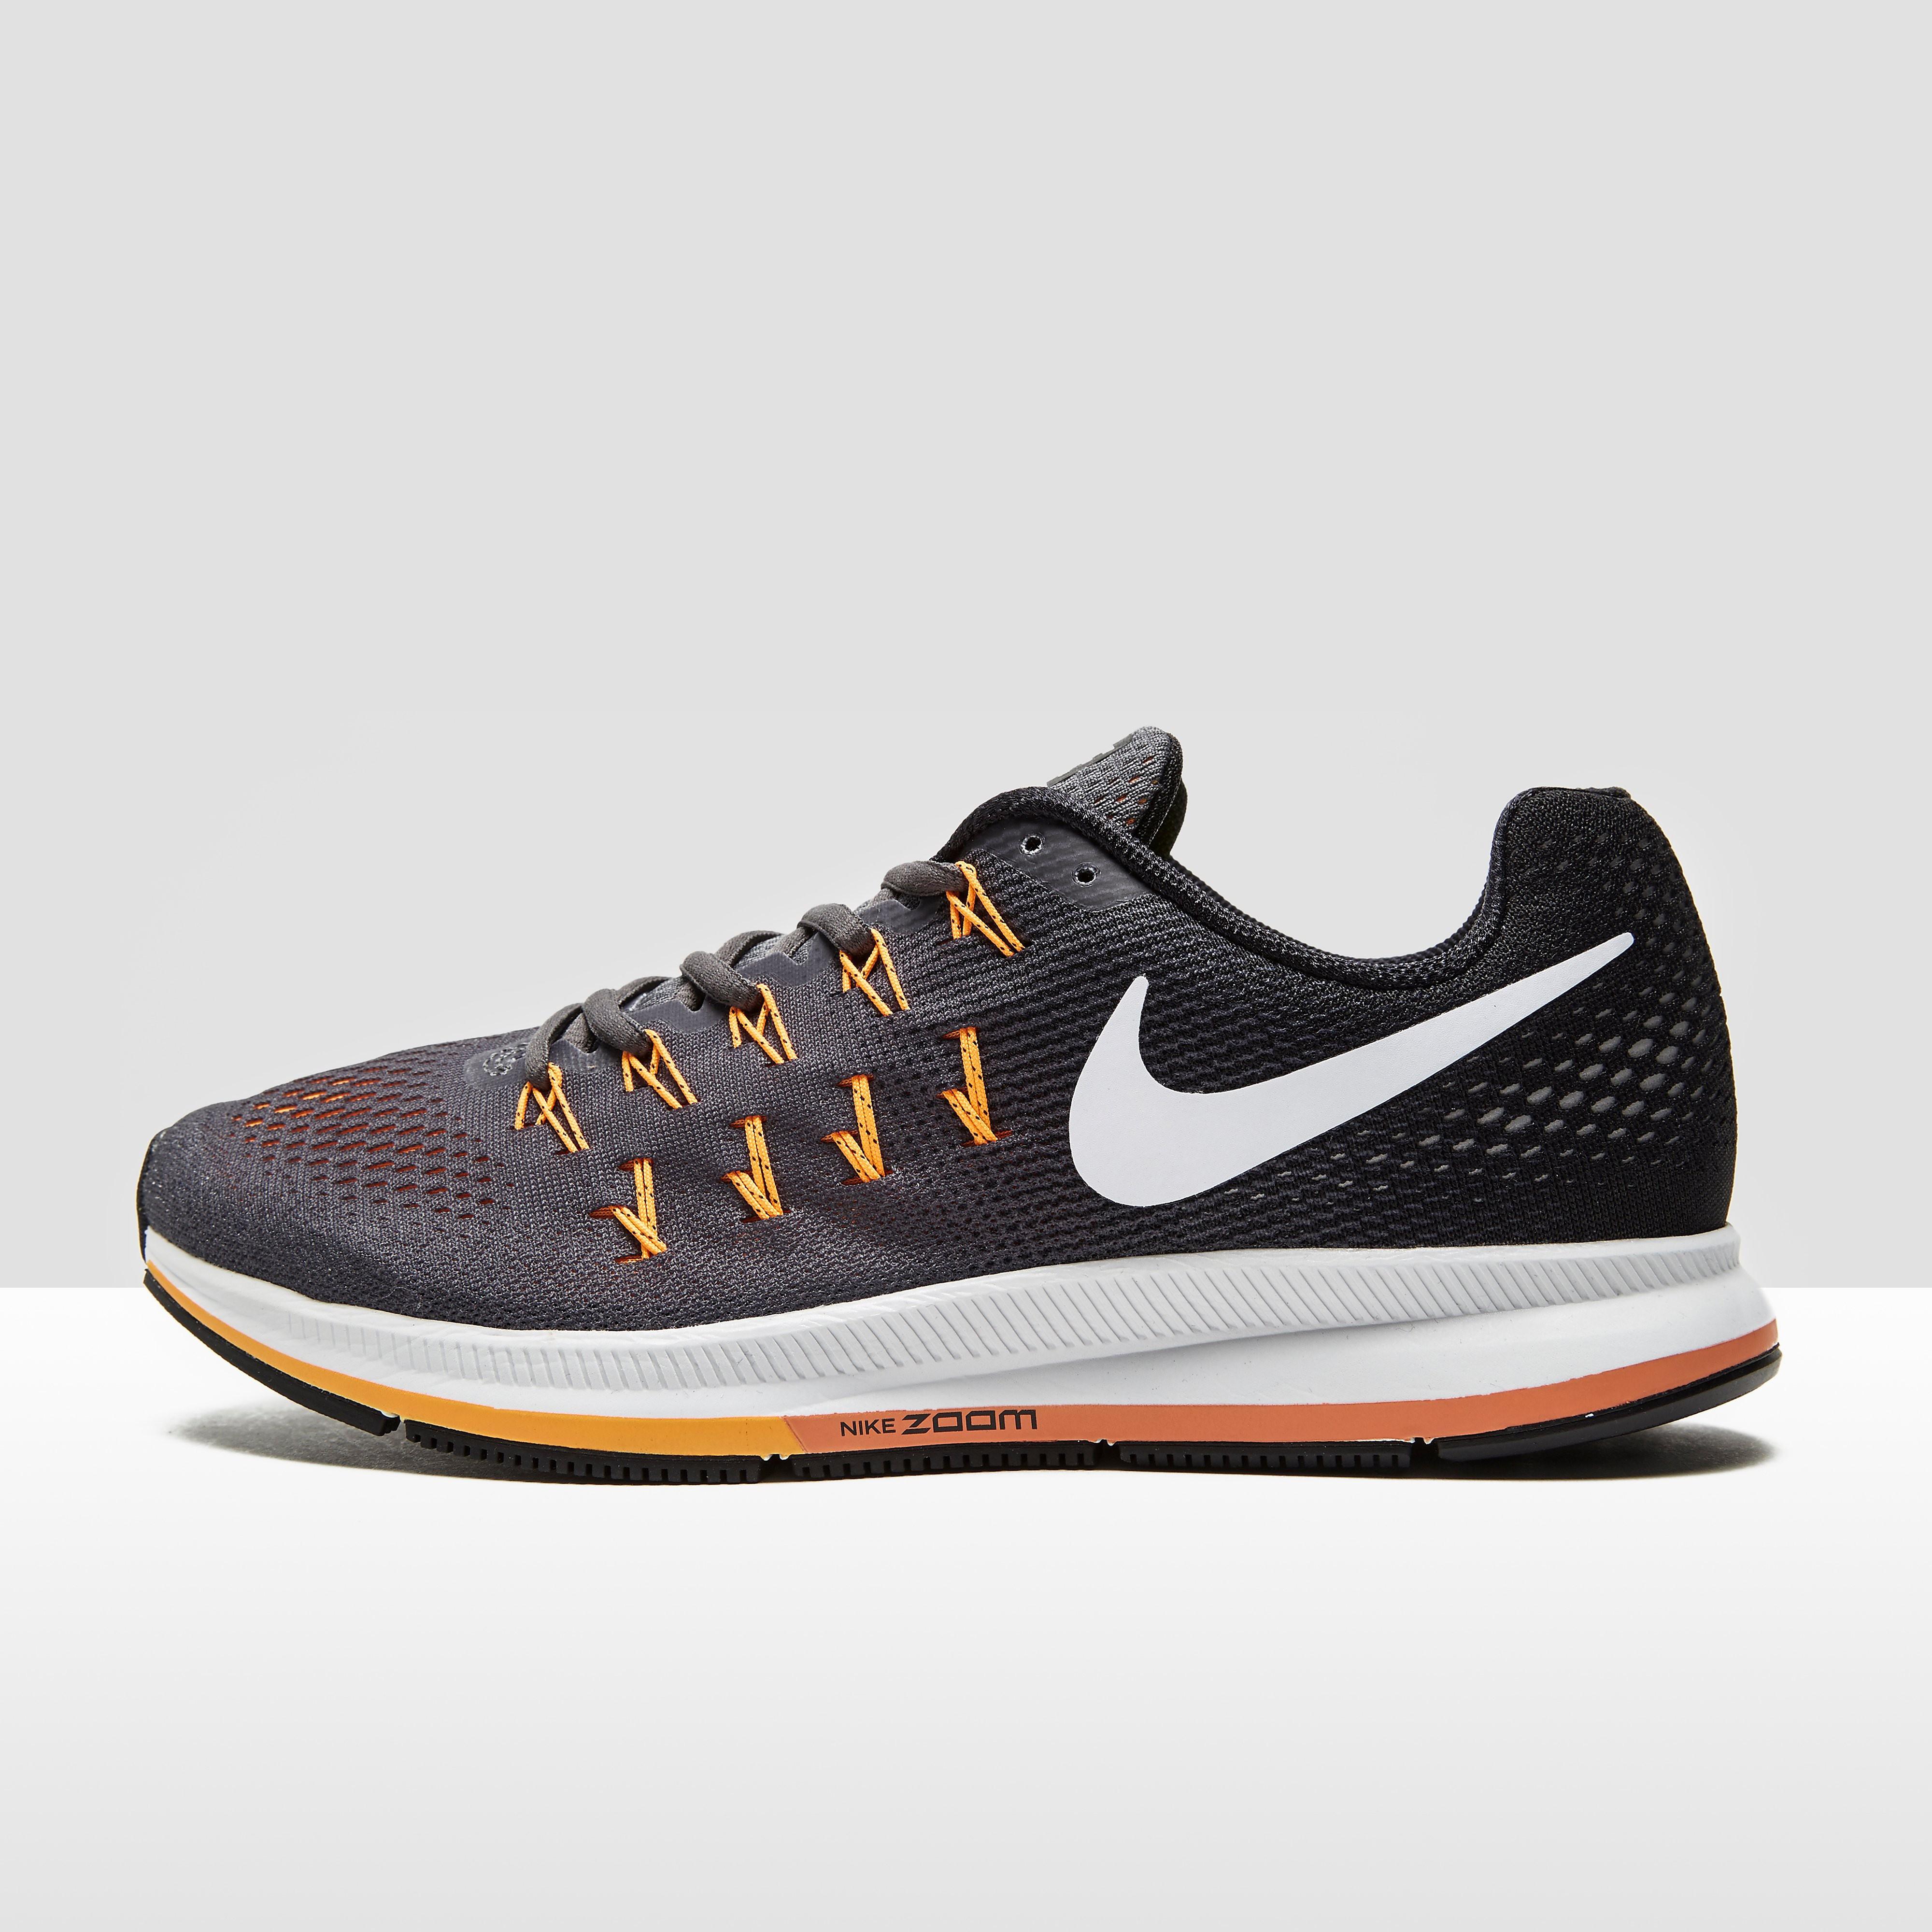 Nike AIR ZOOM PEGASUS 33 Men's Running Shoes